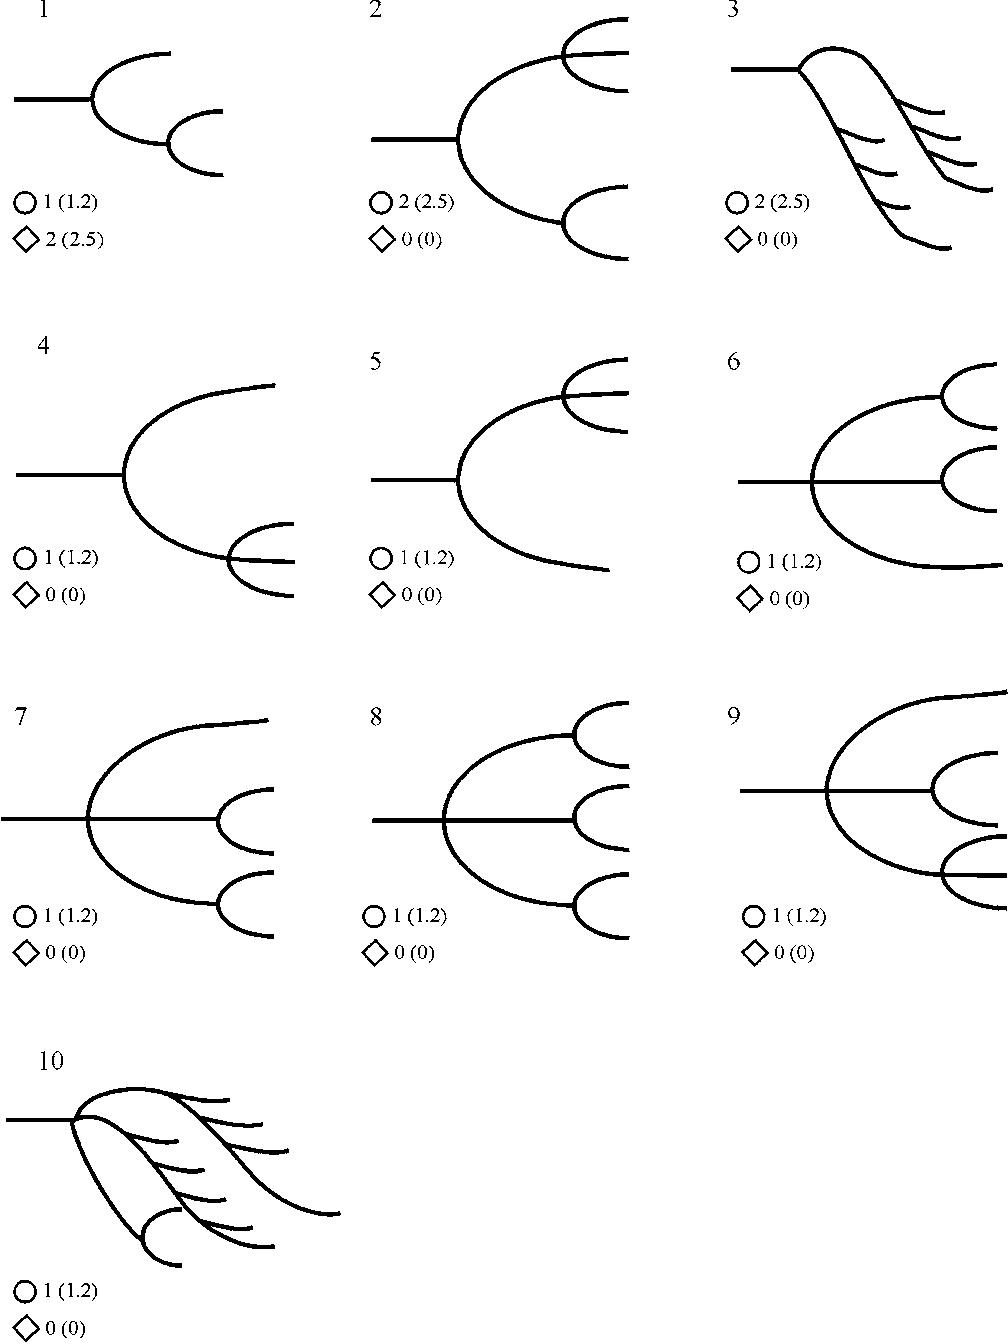 Peri-hilar branching patterns and morphologies of the renal artery ...